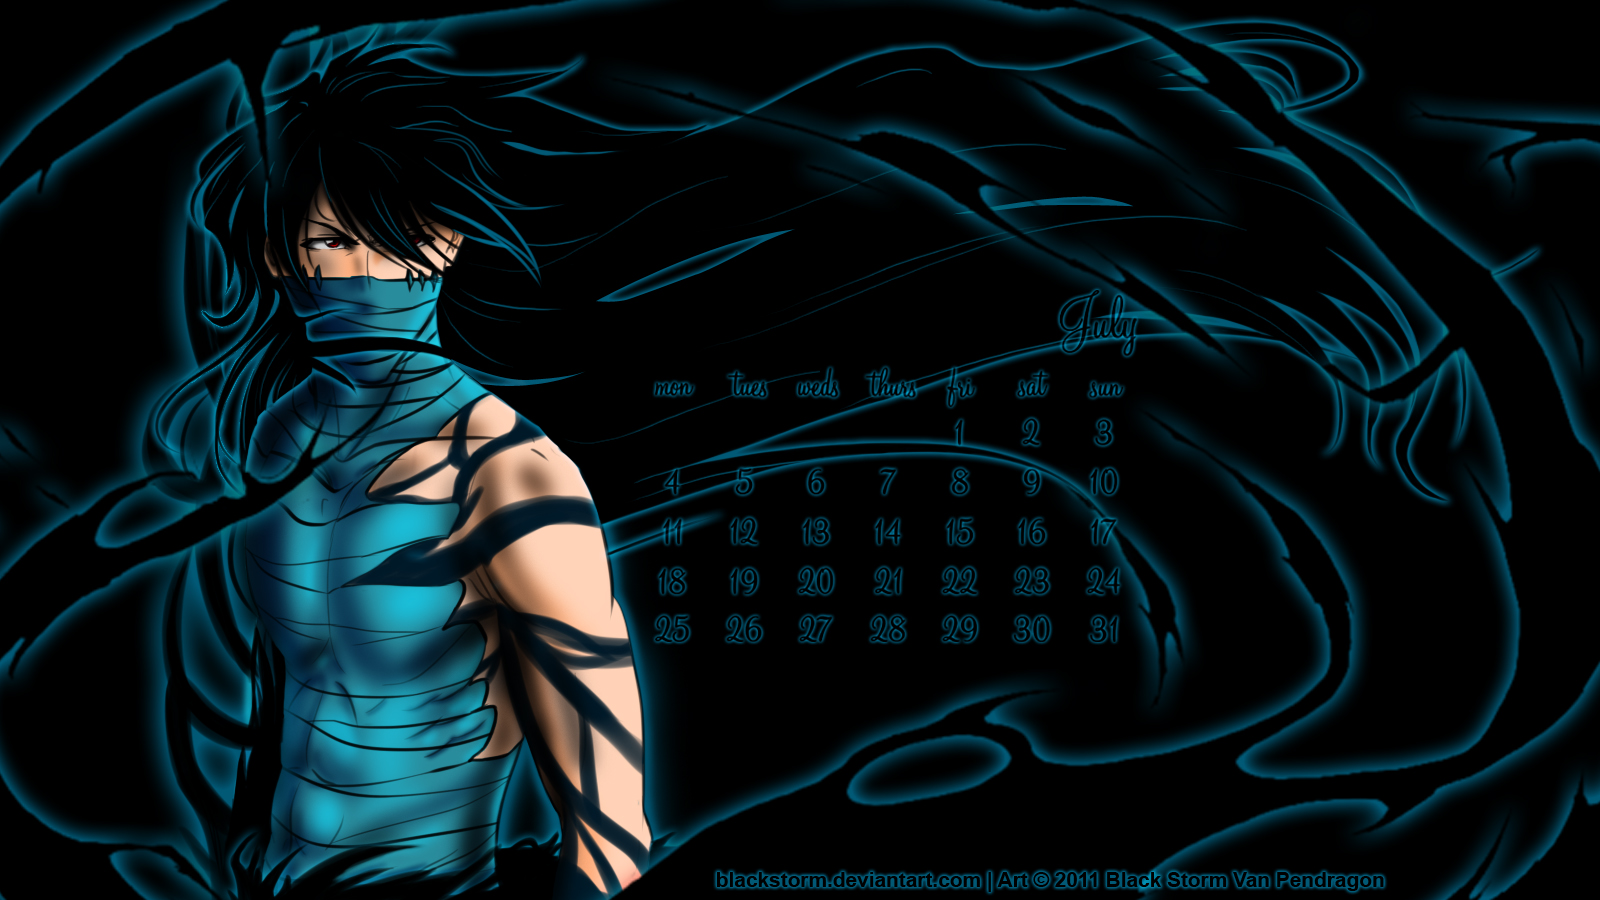 Tags Anime Blackstorm BLEACH Kurosaki Ichigo Mugetsu